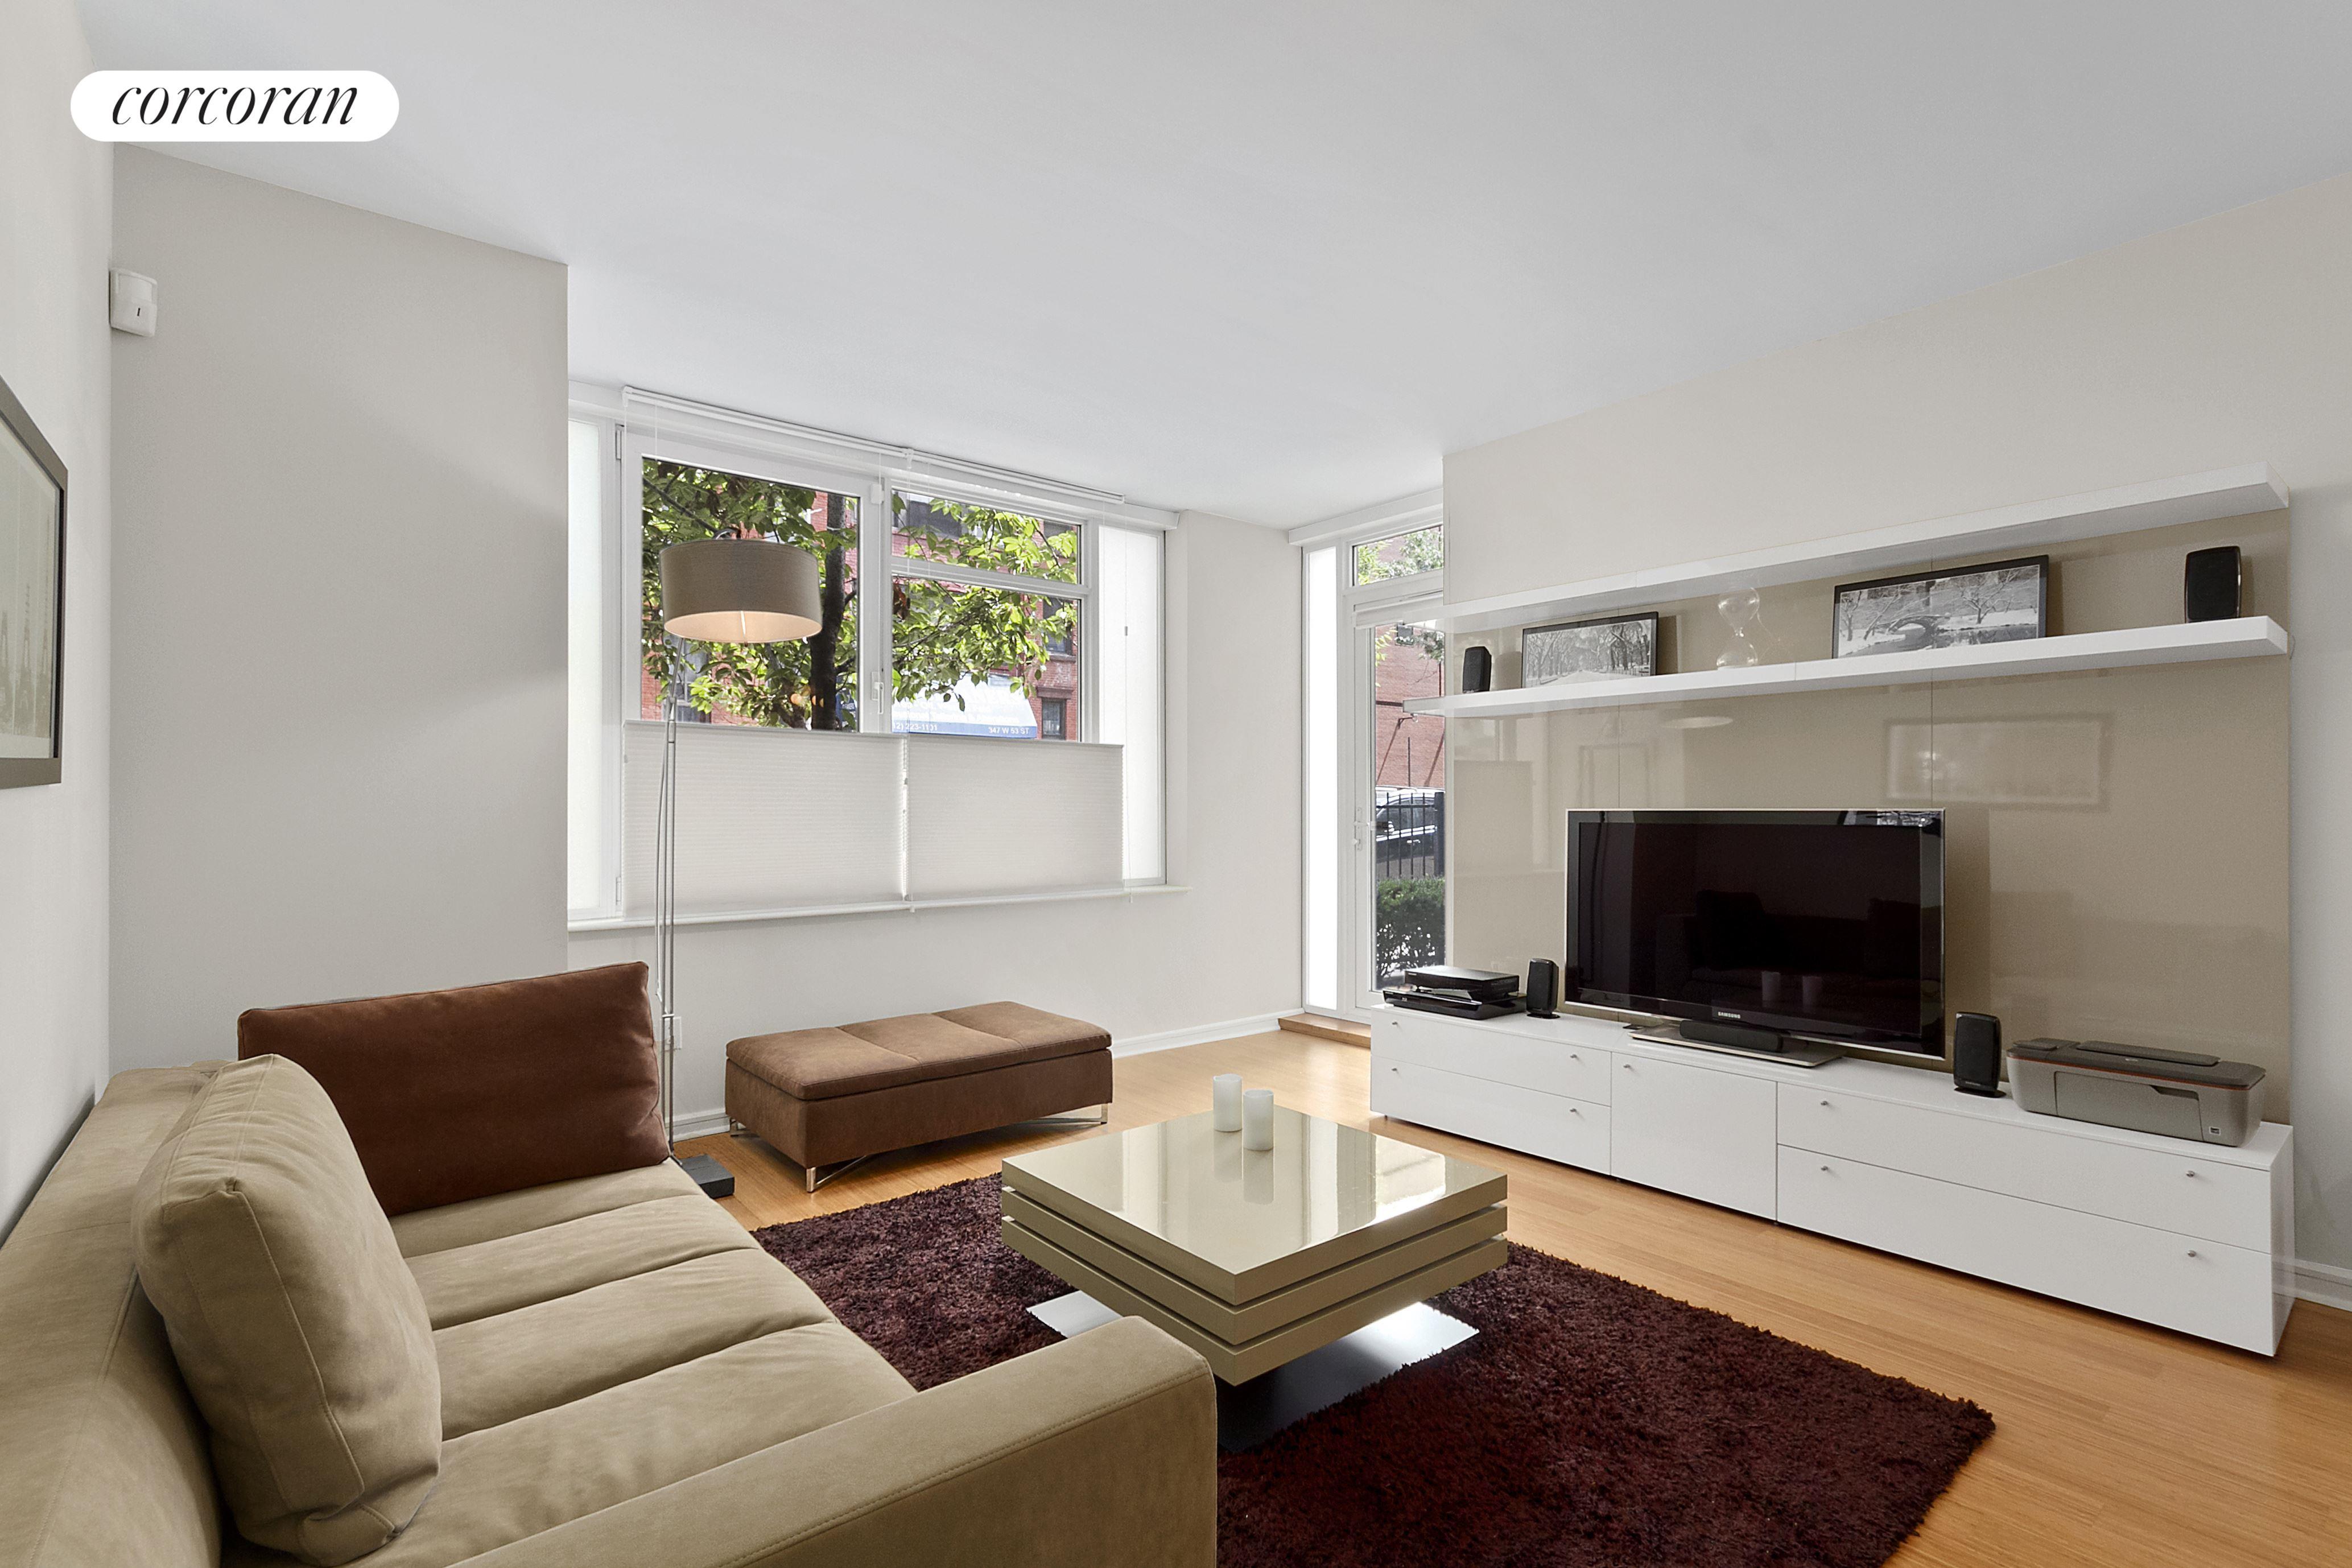 Corcoran, 350 West 53, Apt. THE, Midtown West Real Estate, Manhattan ...